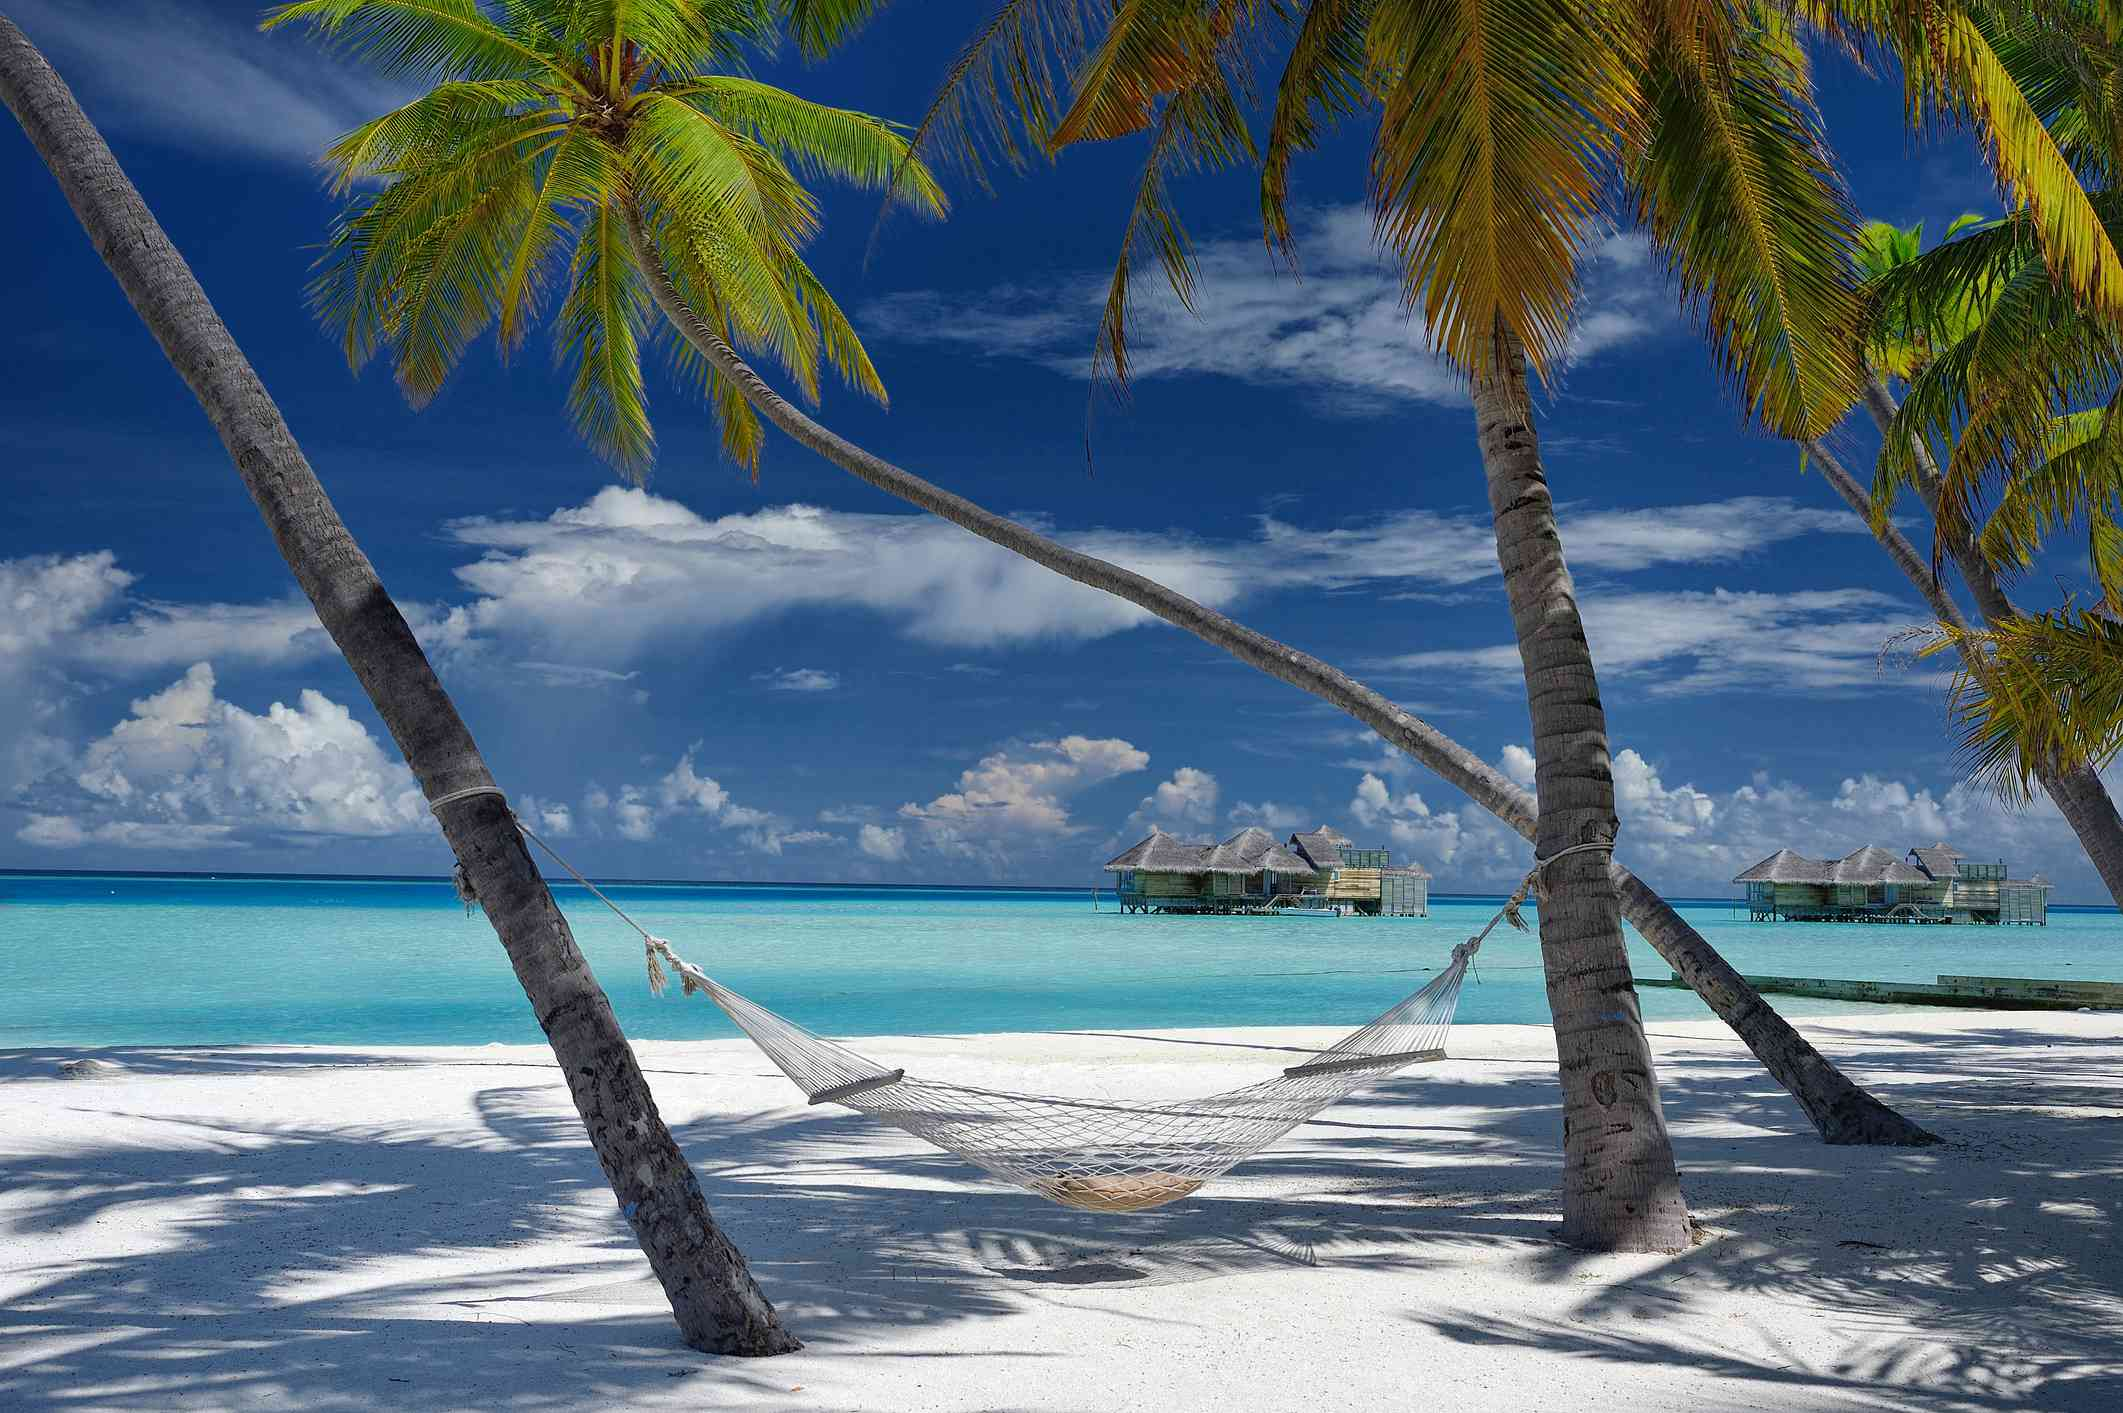 White sand and turquoise sea at Gili Lankanfushi in the Maldives